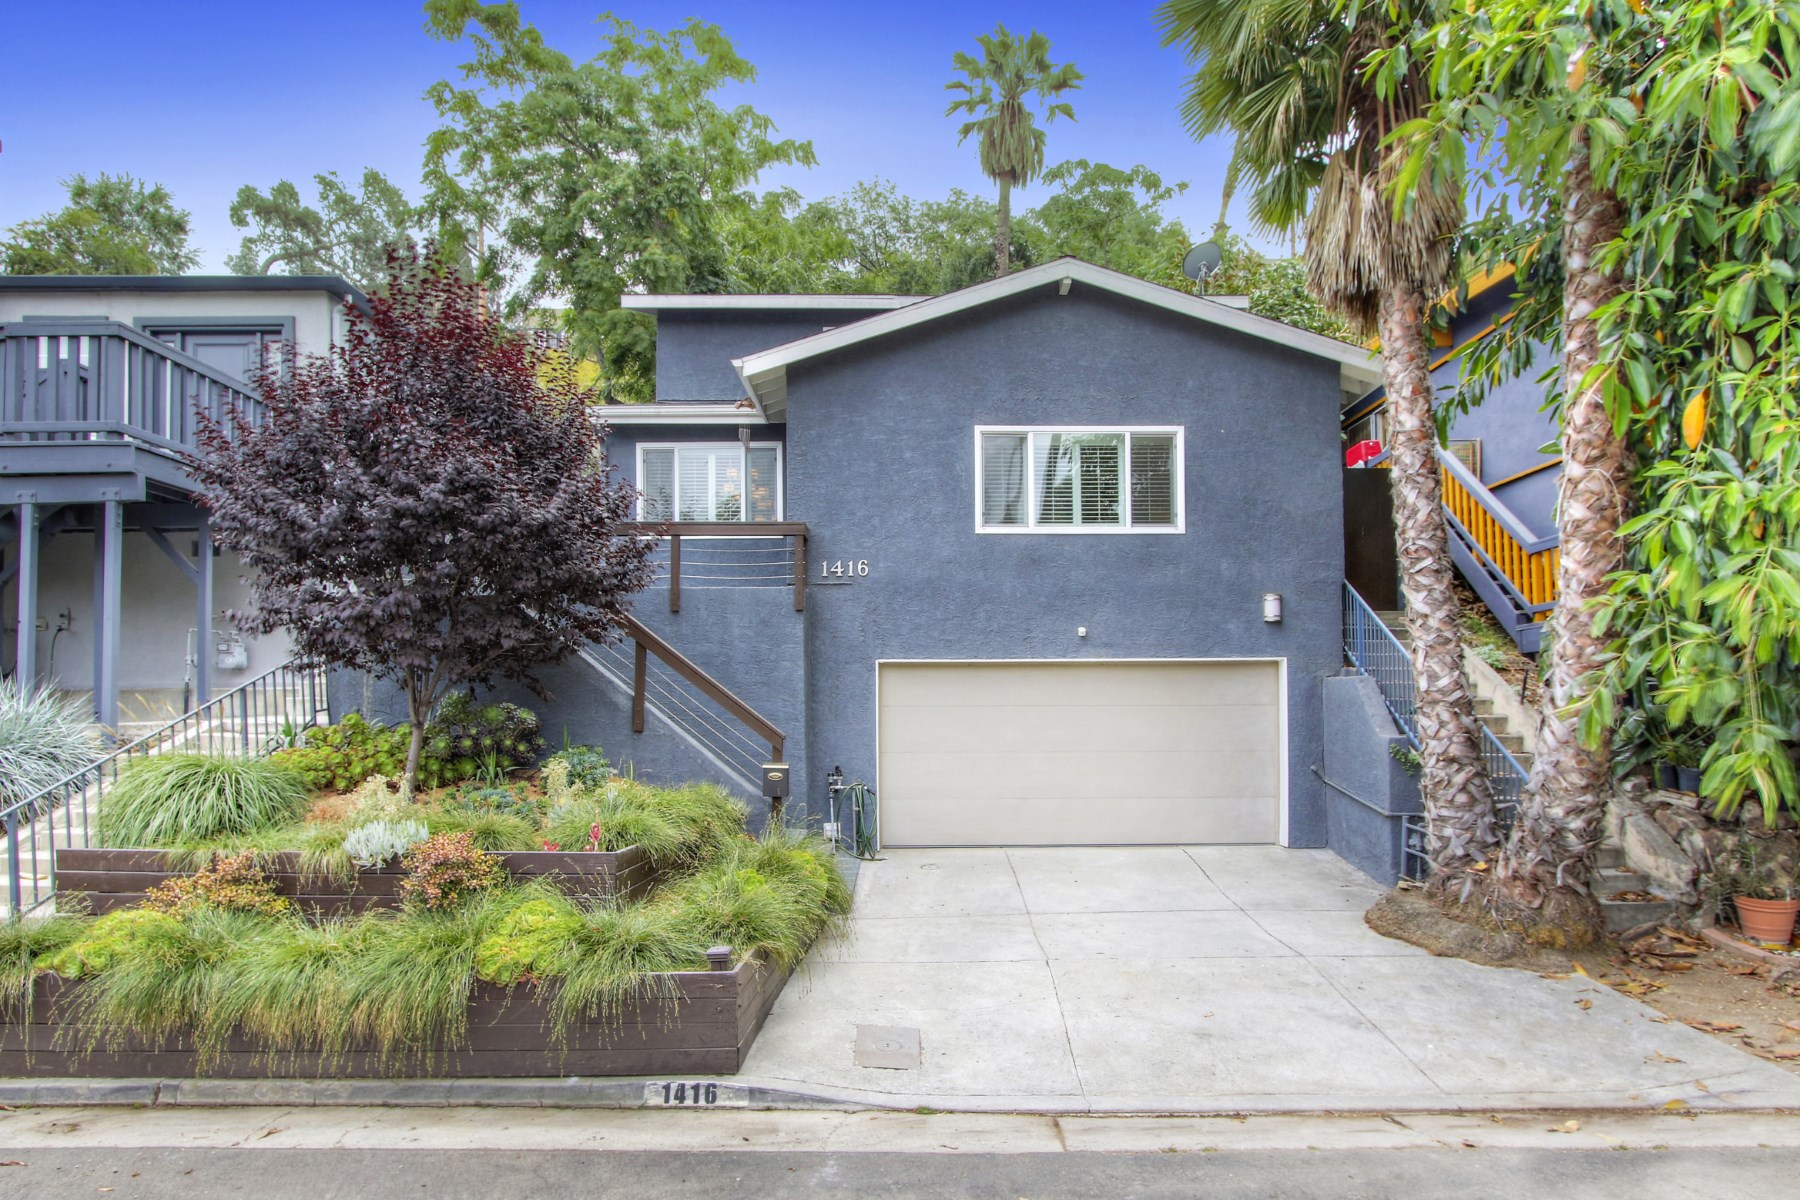 Moradia para Venda às 1416 North Occidental Boulevard Silver Lake, Los Angeles, Califórnia, 90026 Estados Unidos